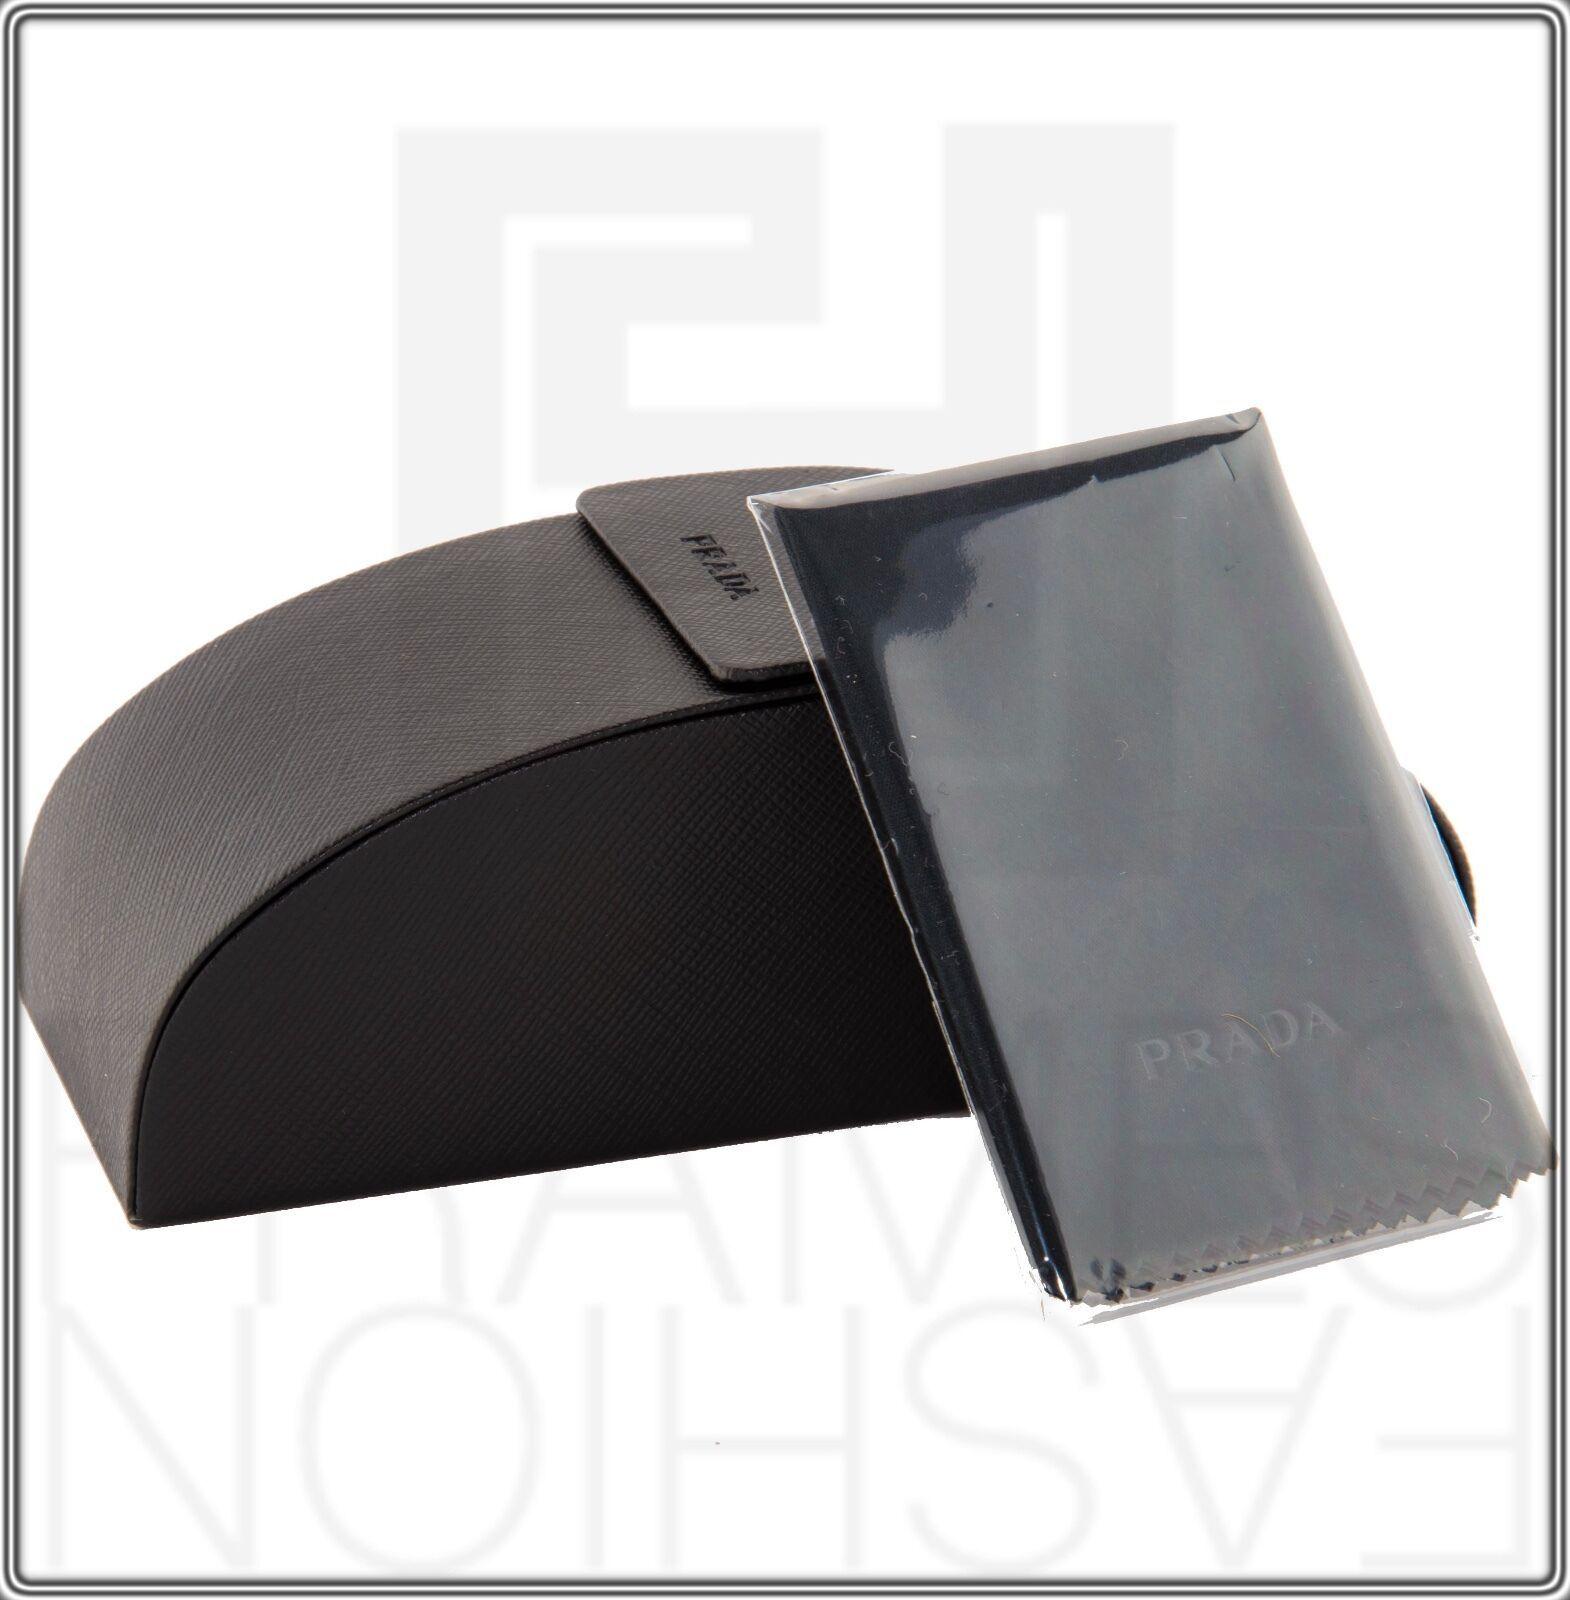 PRADA Brown Pearl Bronze Square Metal Sunglasses Unisex PR08IS SPR 08I